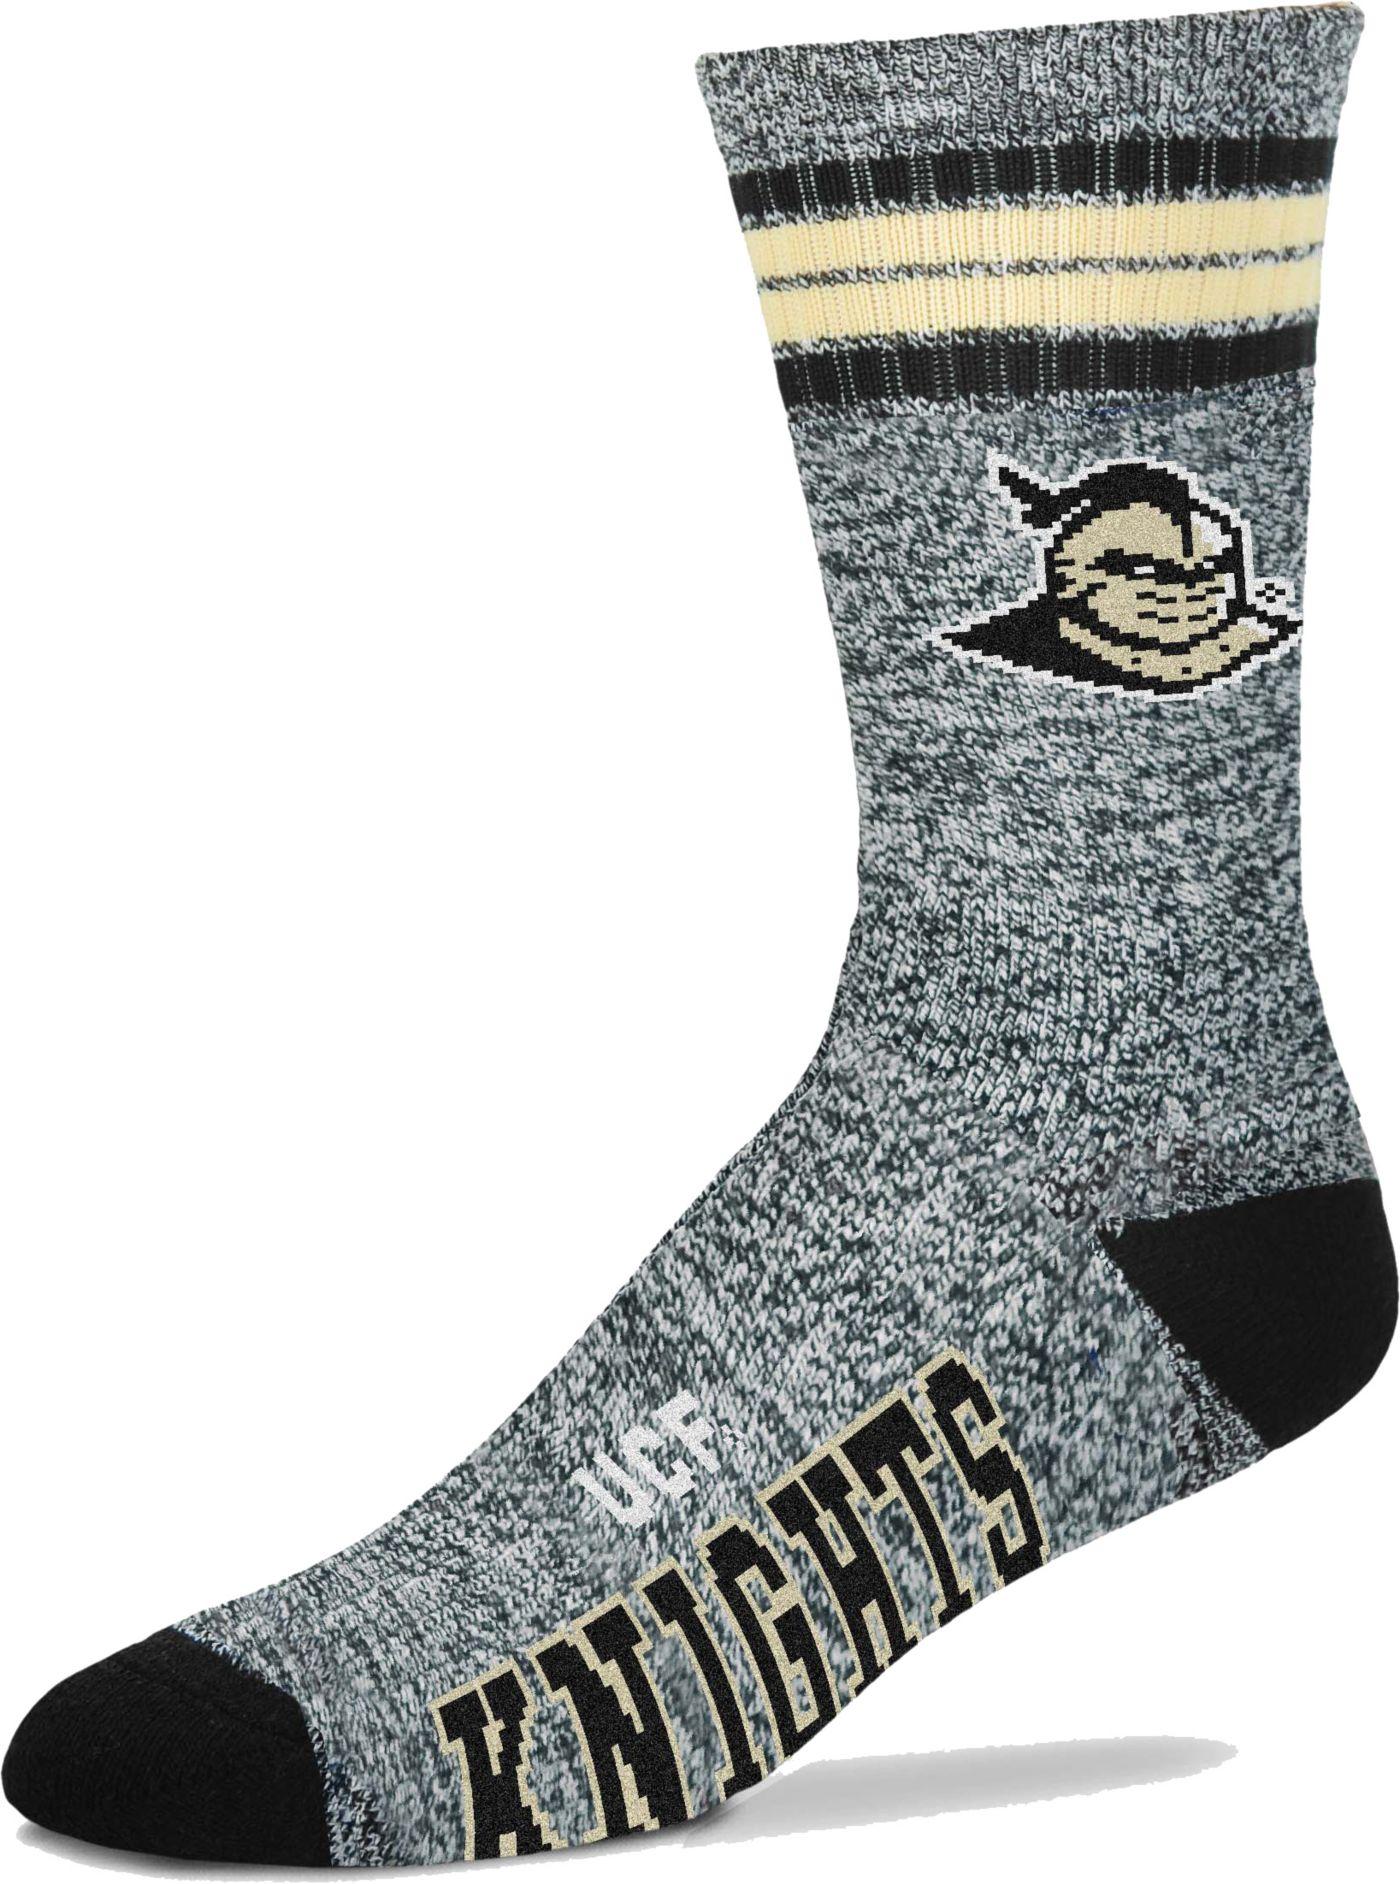 For Bare Feet UCF Knights Four Stripe Marbled Deuce Socks